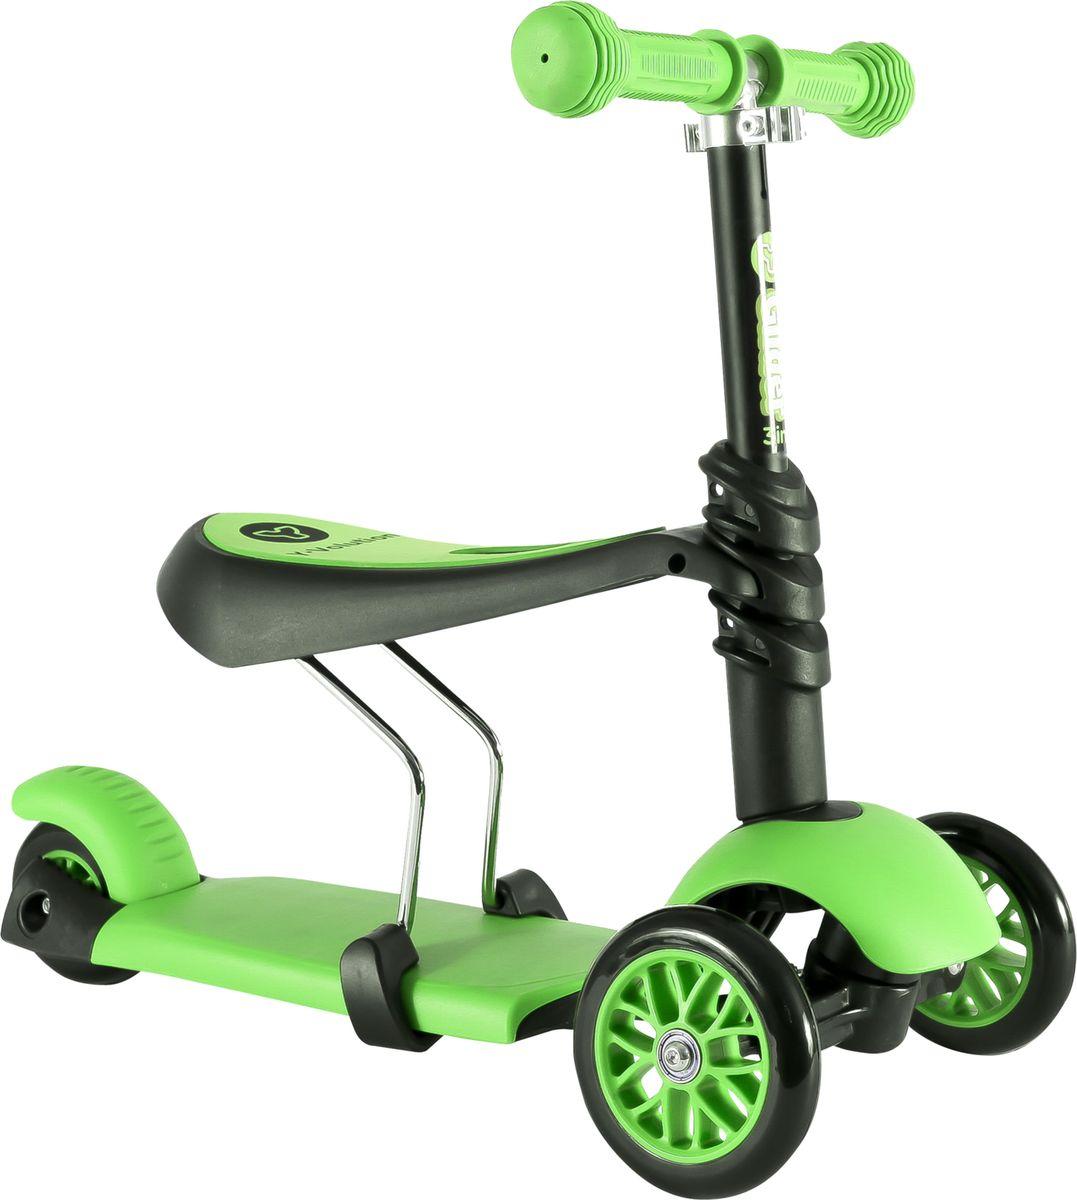 YVolution Самокат-беговел Glider 3 в 1 цвет зеленый самокат glider mini deluxe